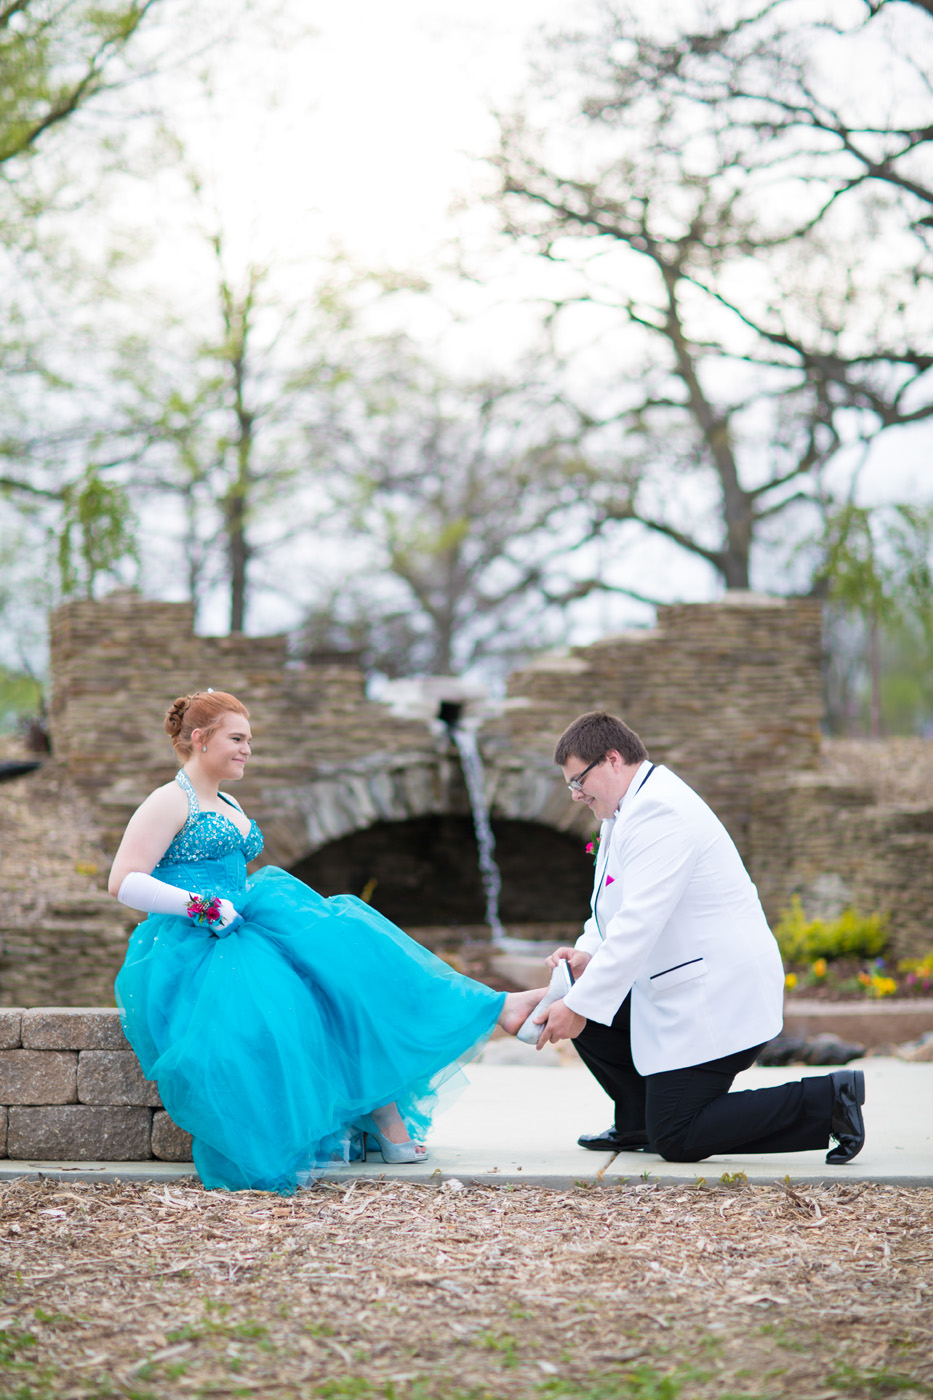 Garrett & Helen Prom 2014 193.jpg